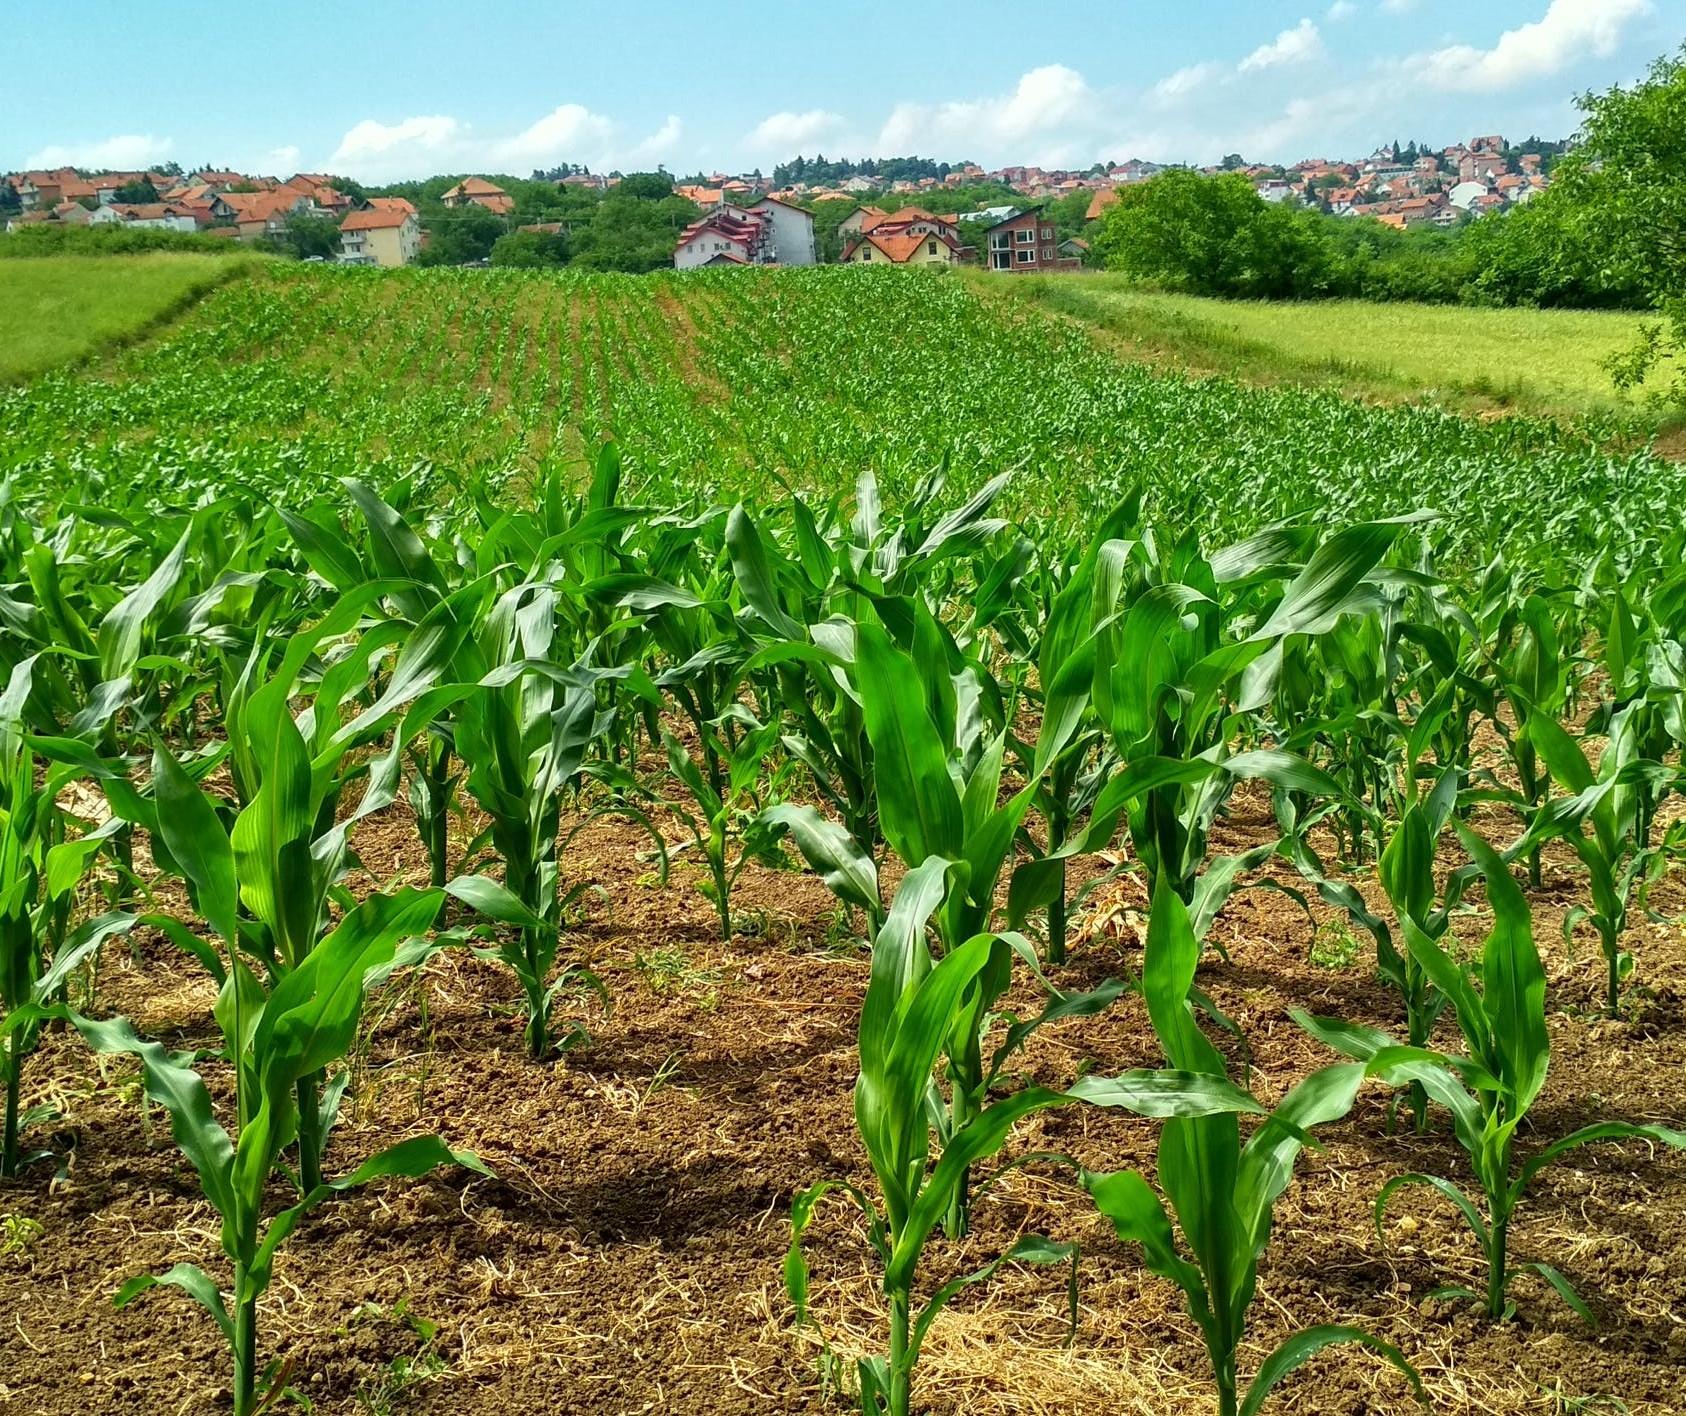 Coronavírus: efeitos no agronegócio